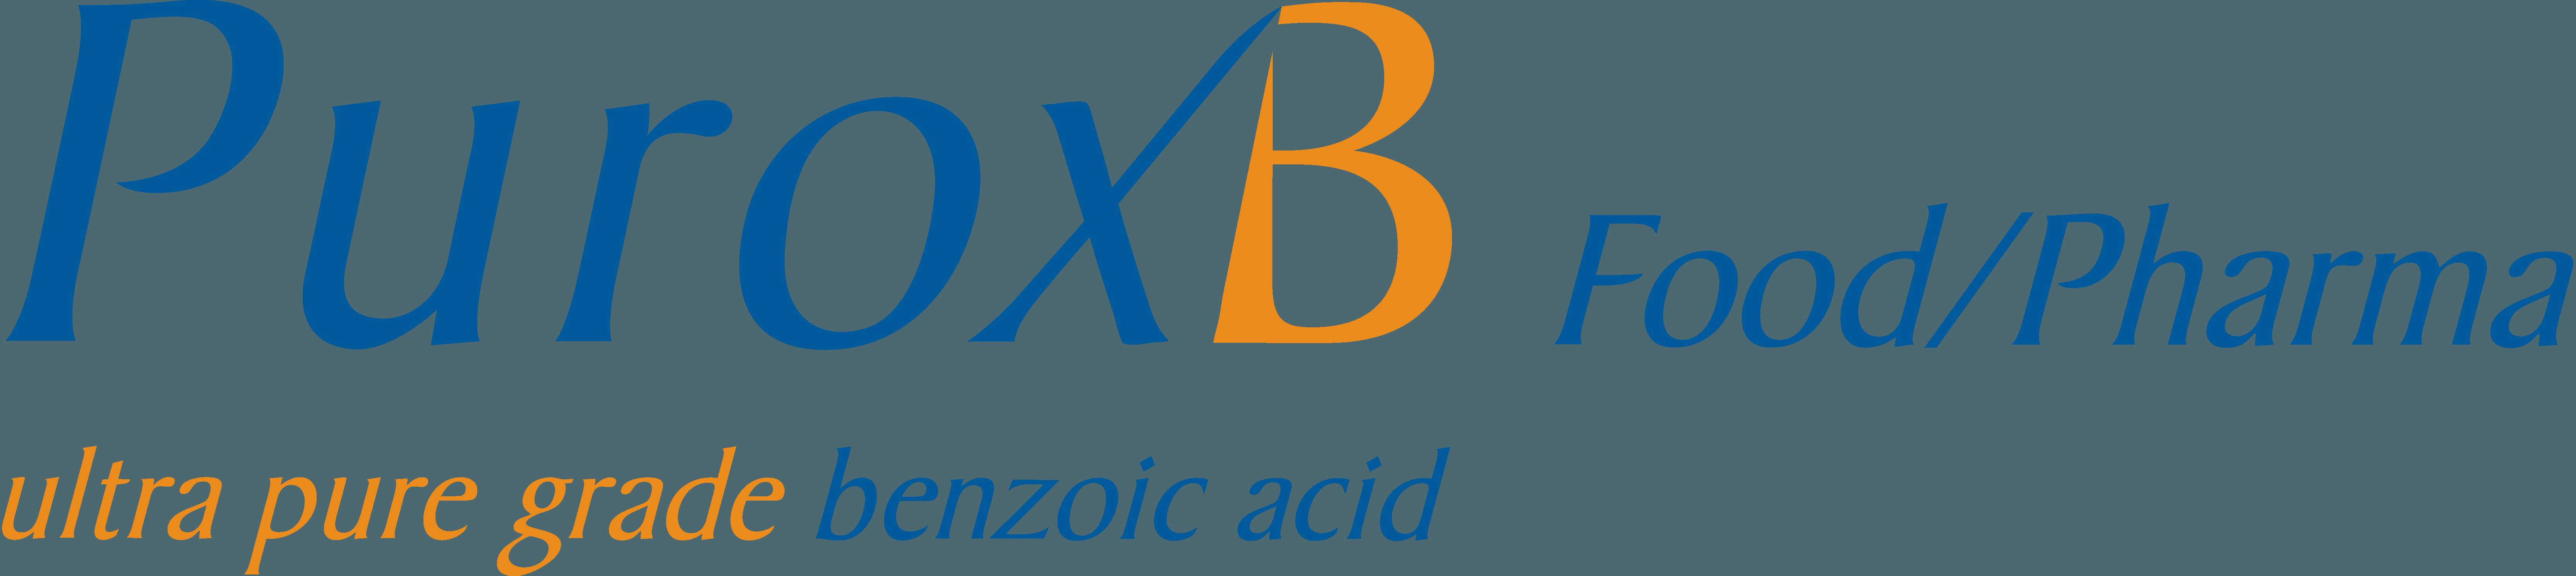 Purox® B Food/Pharma Benzoic Acid - Emerald Kalama Chemical